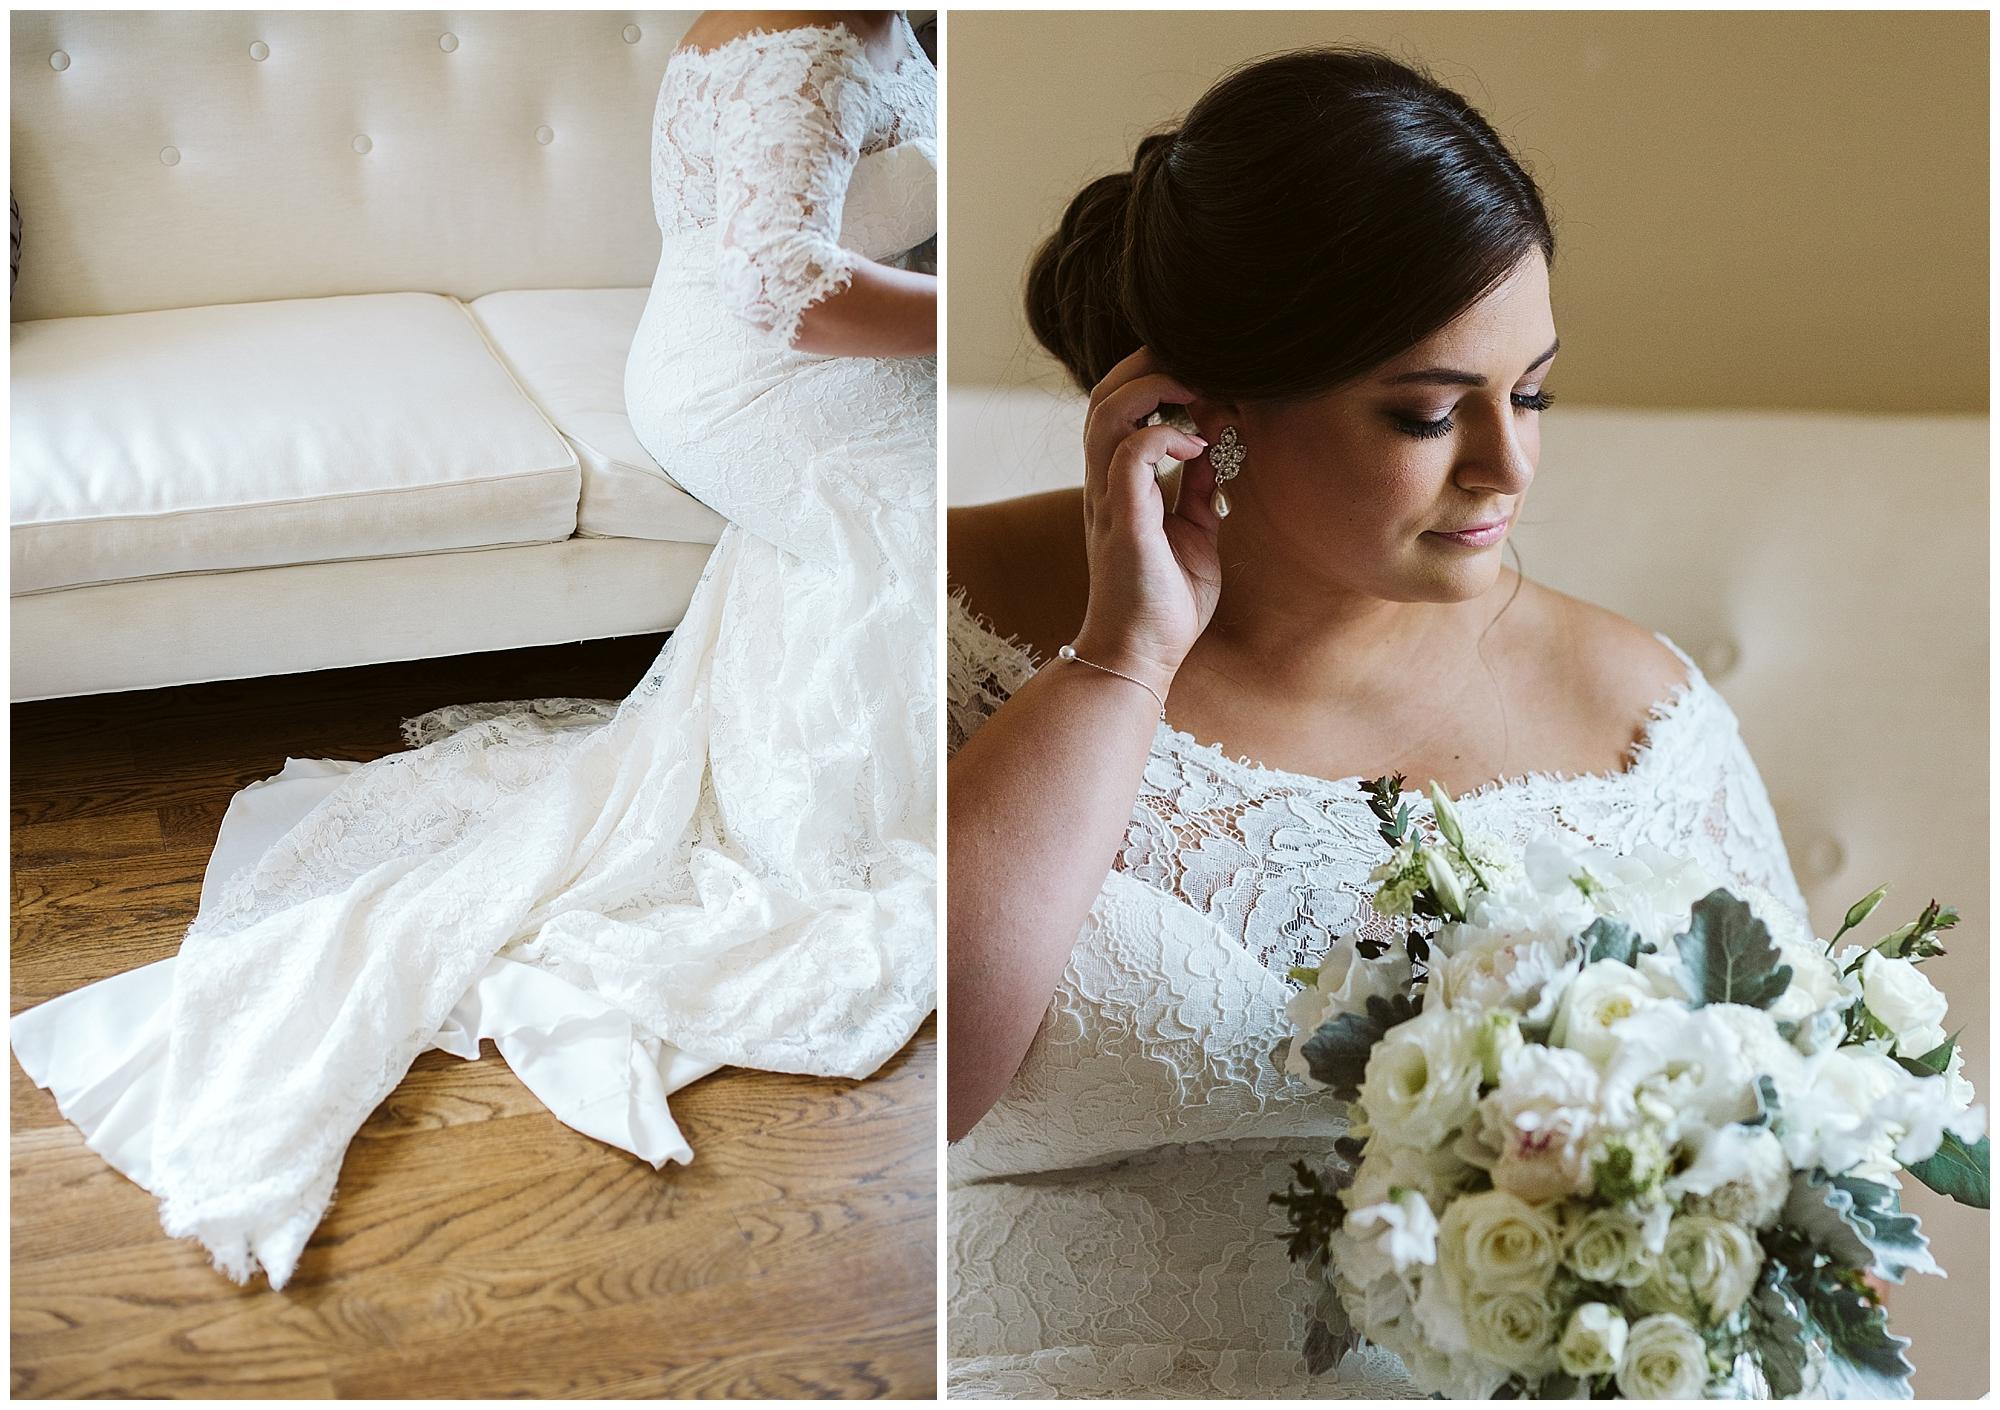 Oaks-at-salem-wedding-apex-photography-32.jpg